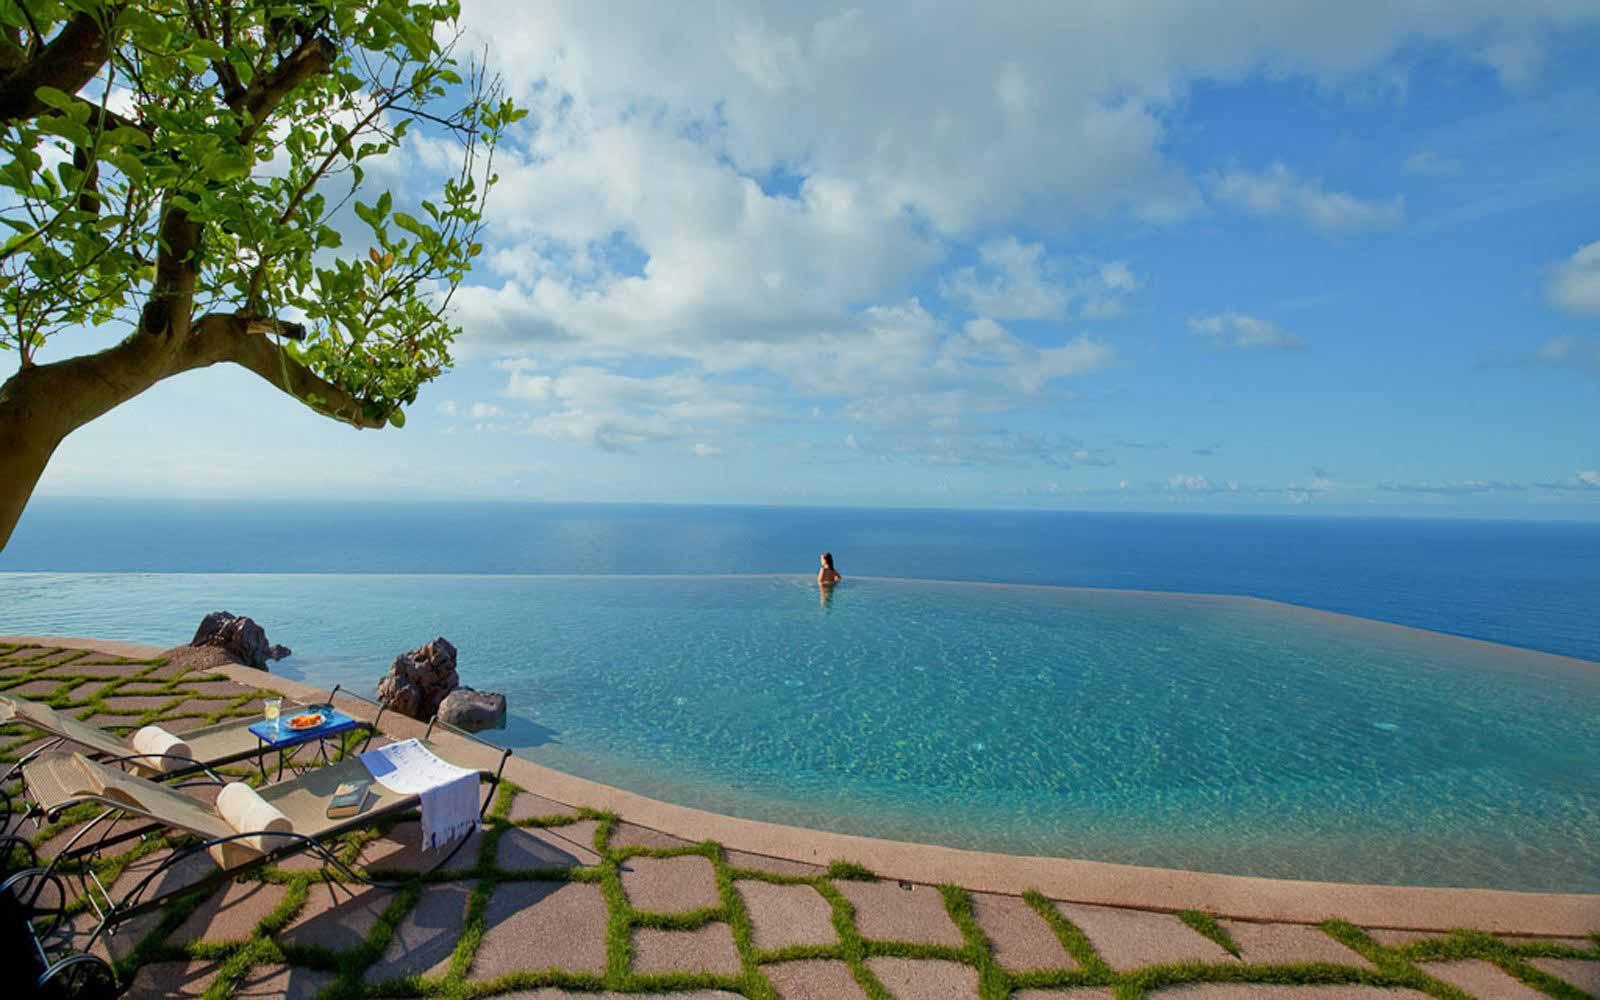 Infinity pool merging with the sea at Monastero Santa Rosa